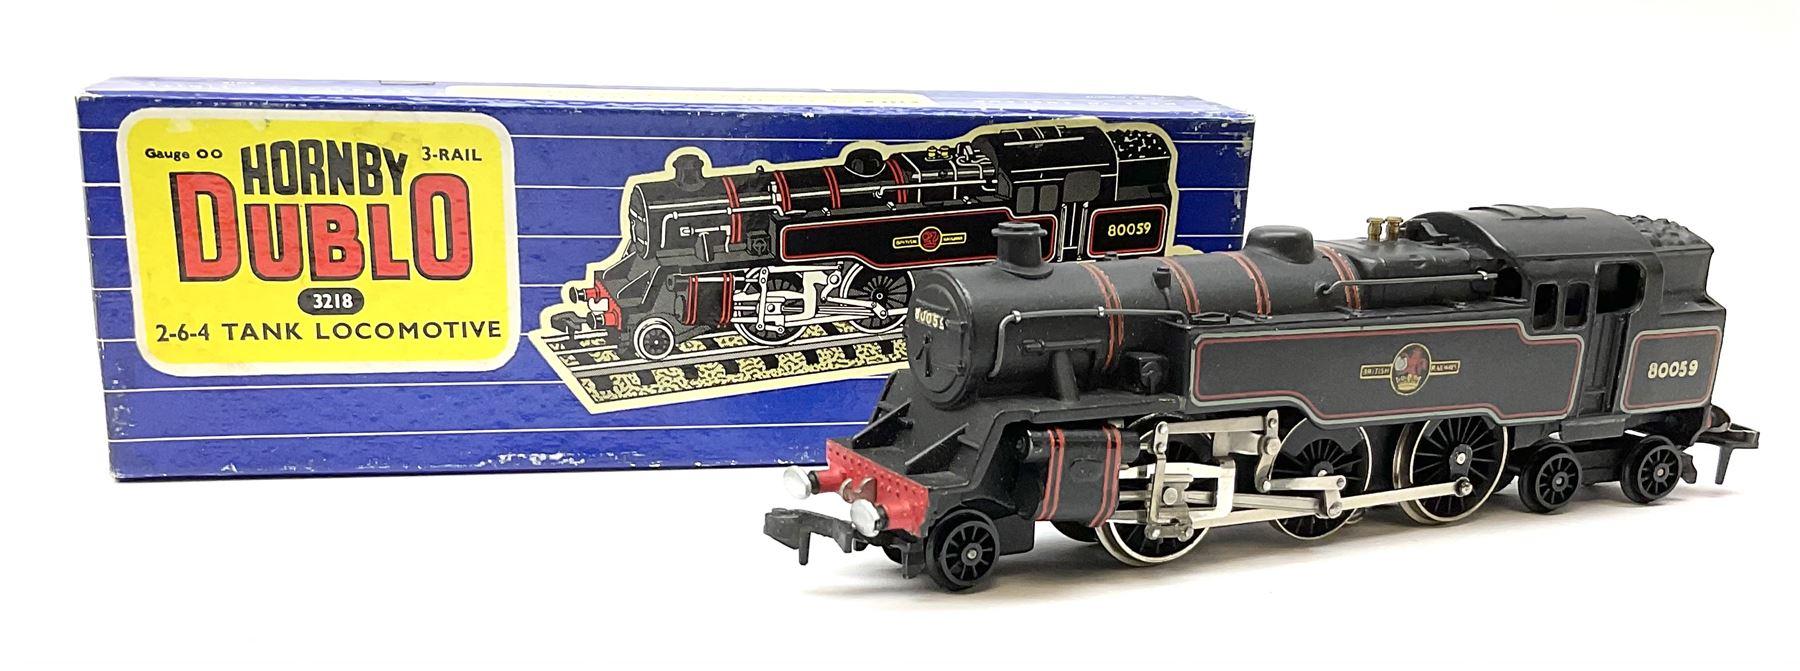 Hornby Dublo - three-rail 4MT Standard 2-6-4 Tank locomotive No.80059 with totems facing forward - Image 2 of 6